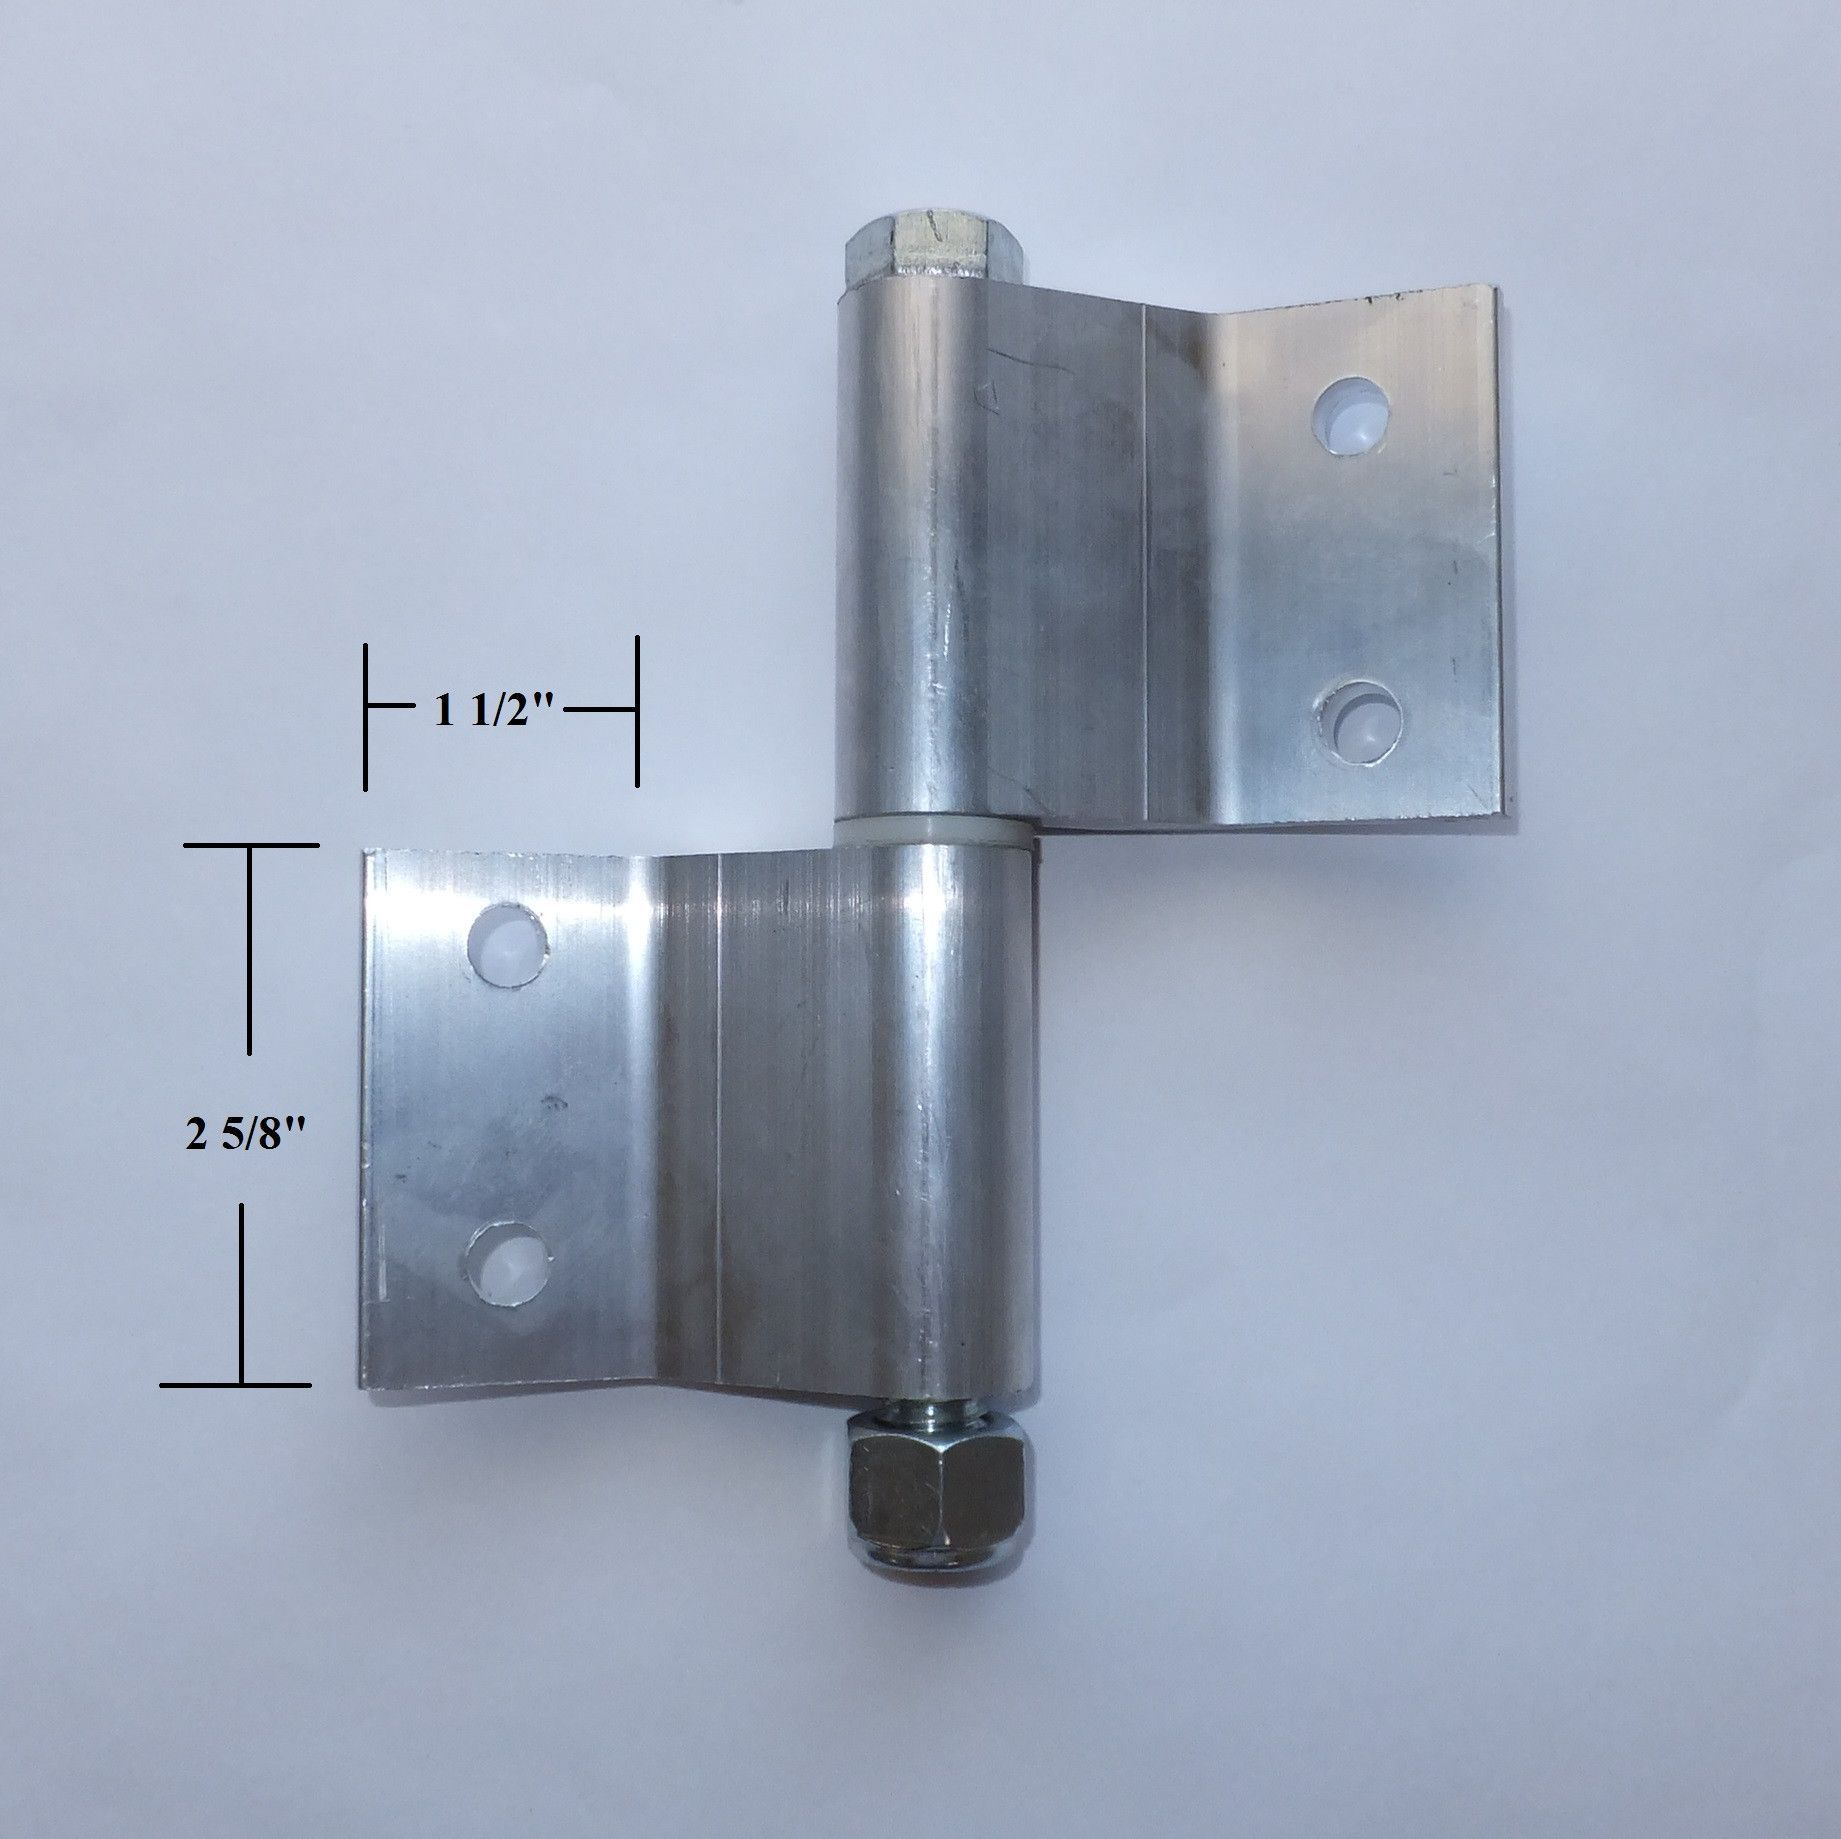 Hinge Aluminum Heavy Duty For Doors Vintage Trailer Remodel Hinges Aluminum